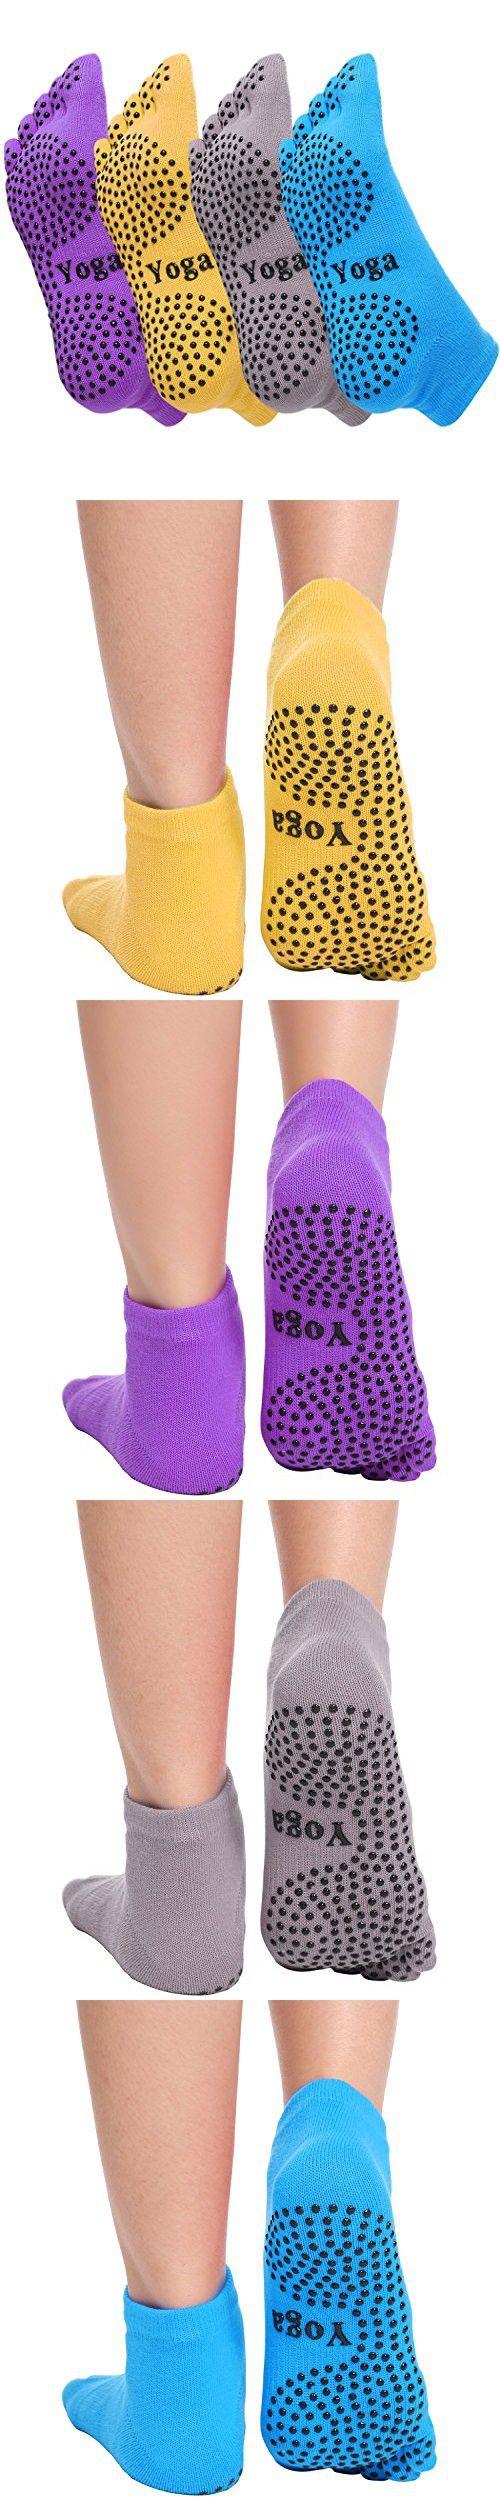 Ekouaer Toe Yoga Pilates Socks Non Slip Skid Barre Sock with Grips for Women & Men (4 Pairs: Blue, Purple, Yellow, Grey)